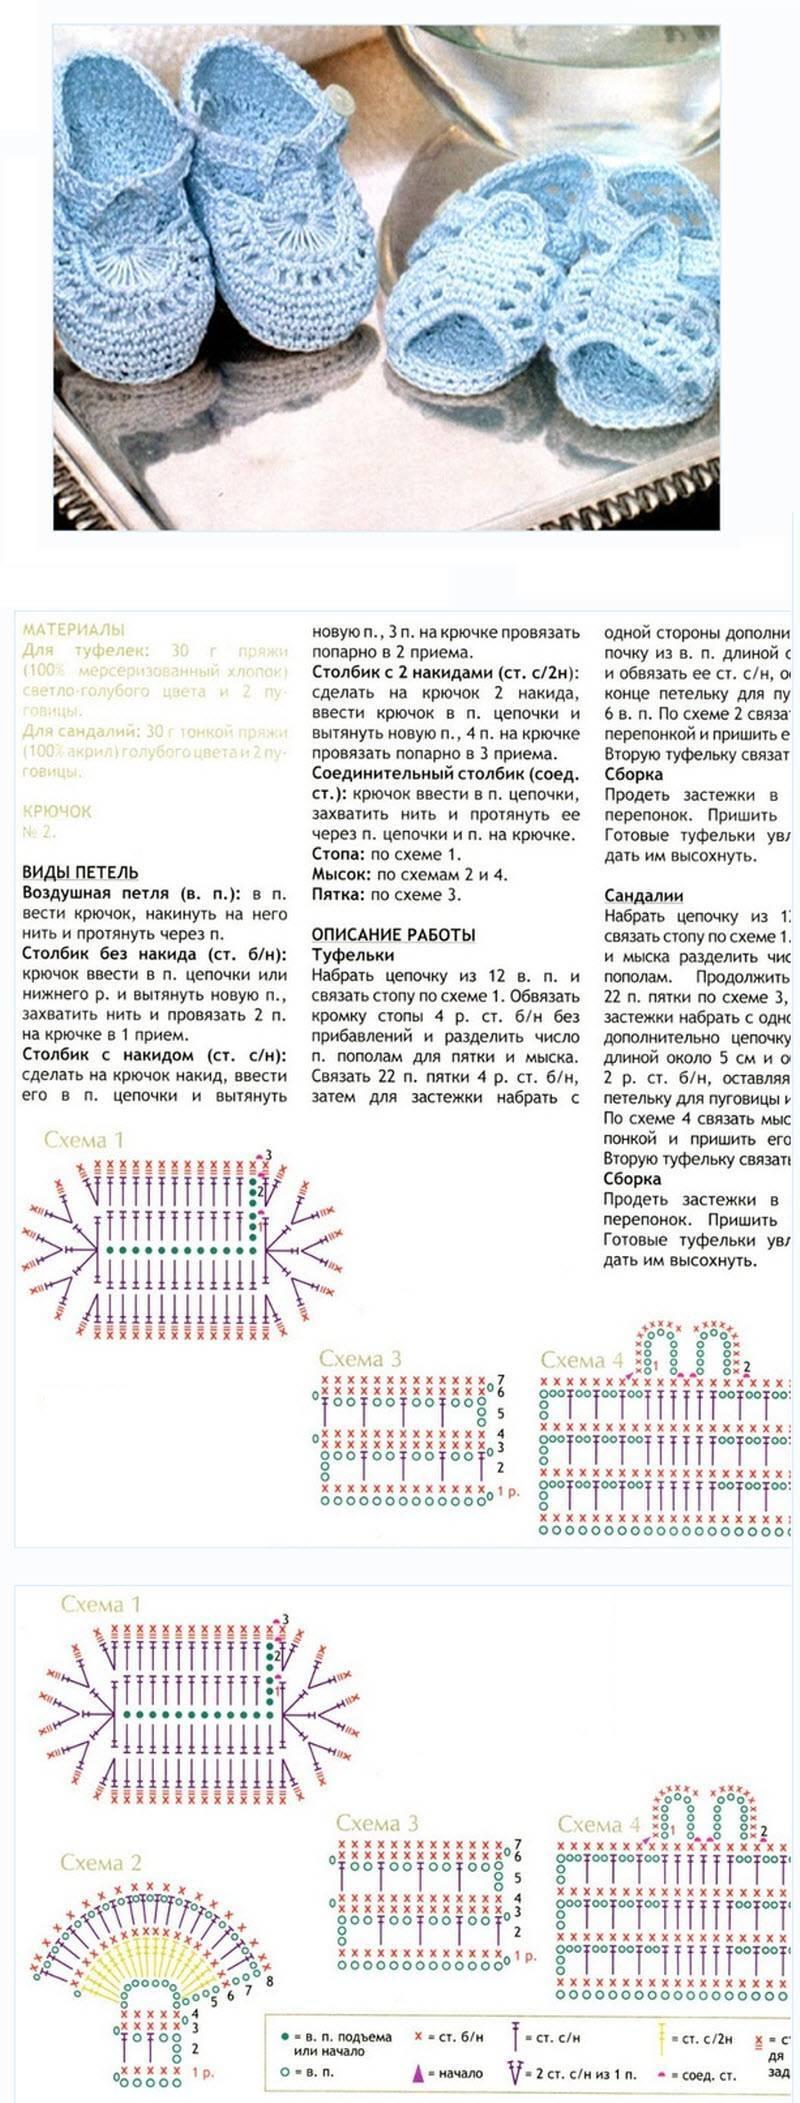 Пинетки крючком - 130 фото описания процесса вязки